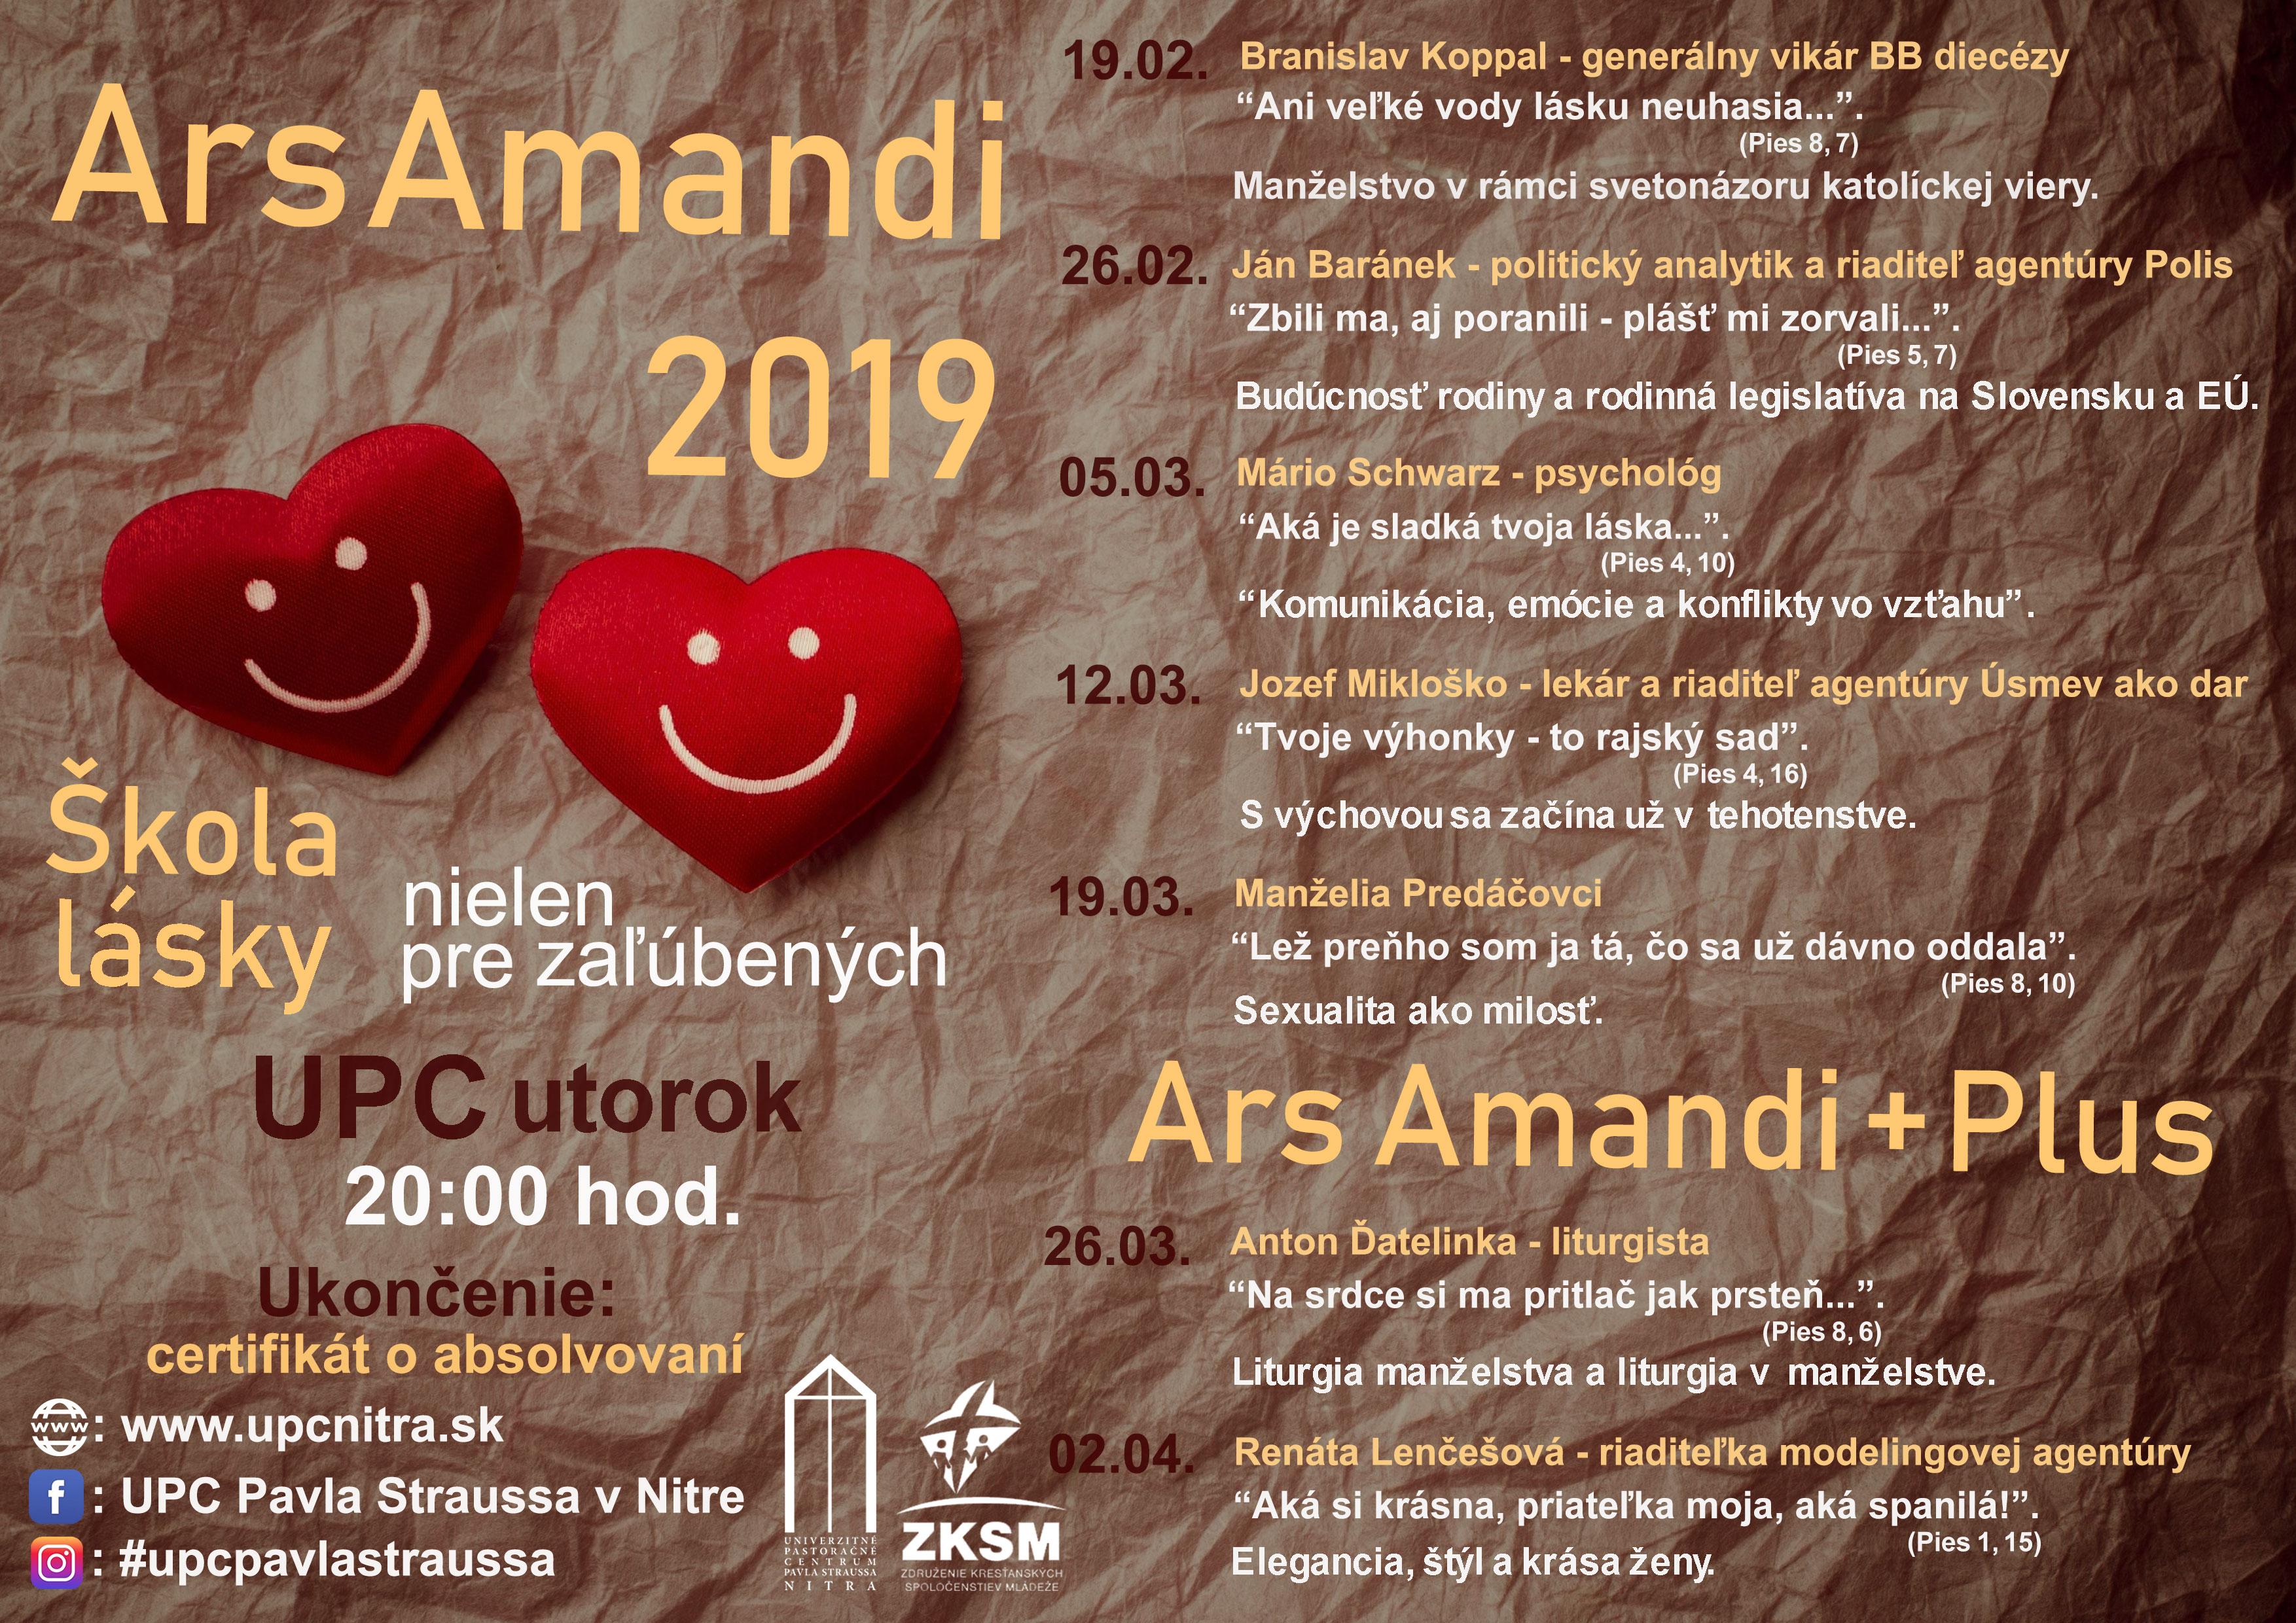 ARS AMANDI 2019